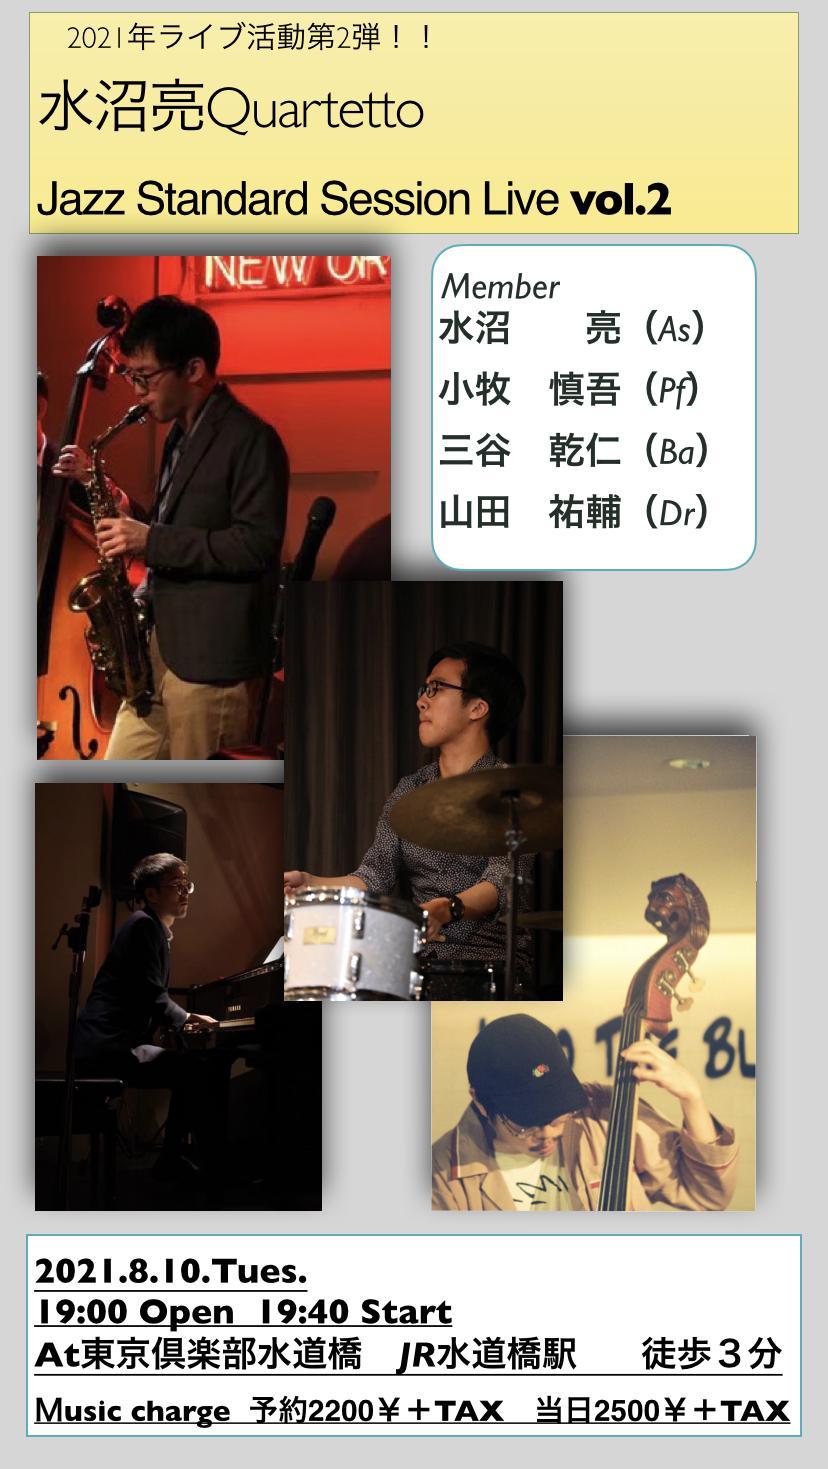 水沼亮Quartetto